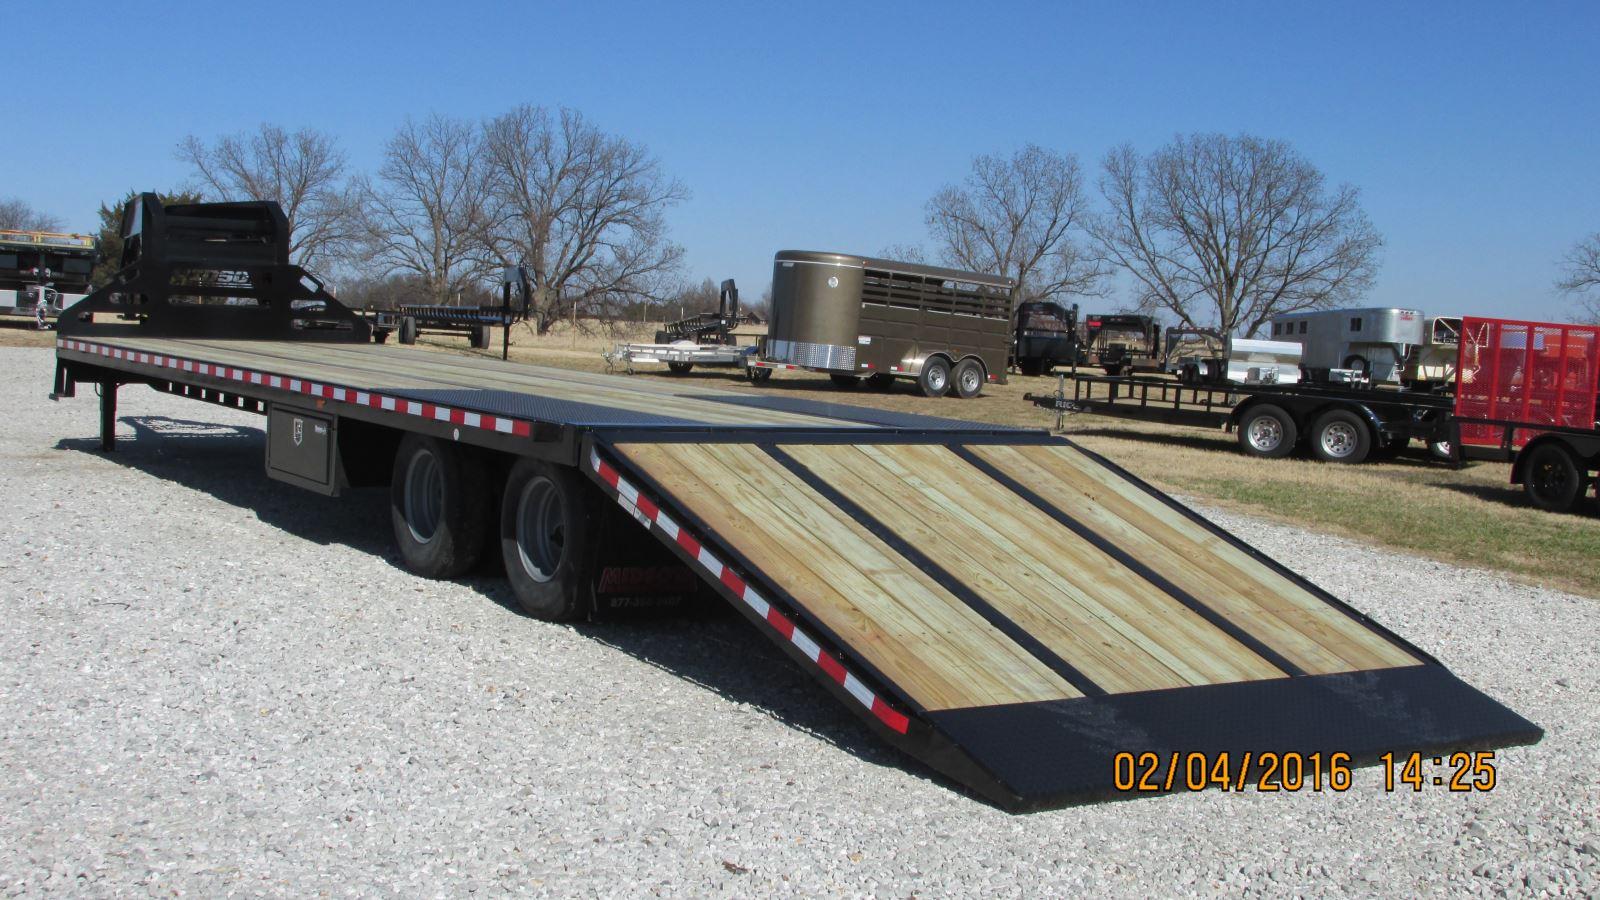 Wiring Diagram For Aluma Trailer : Aluma trailer wiring diagram cargo craft